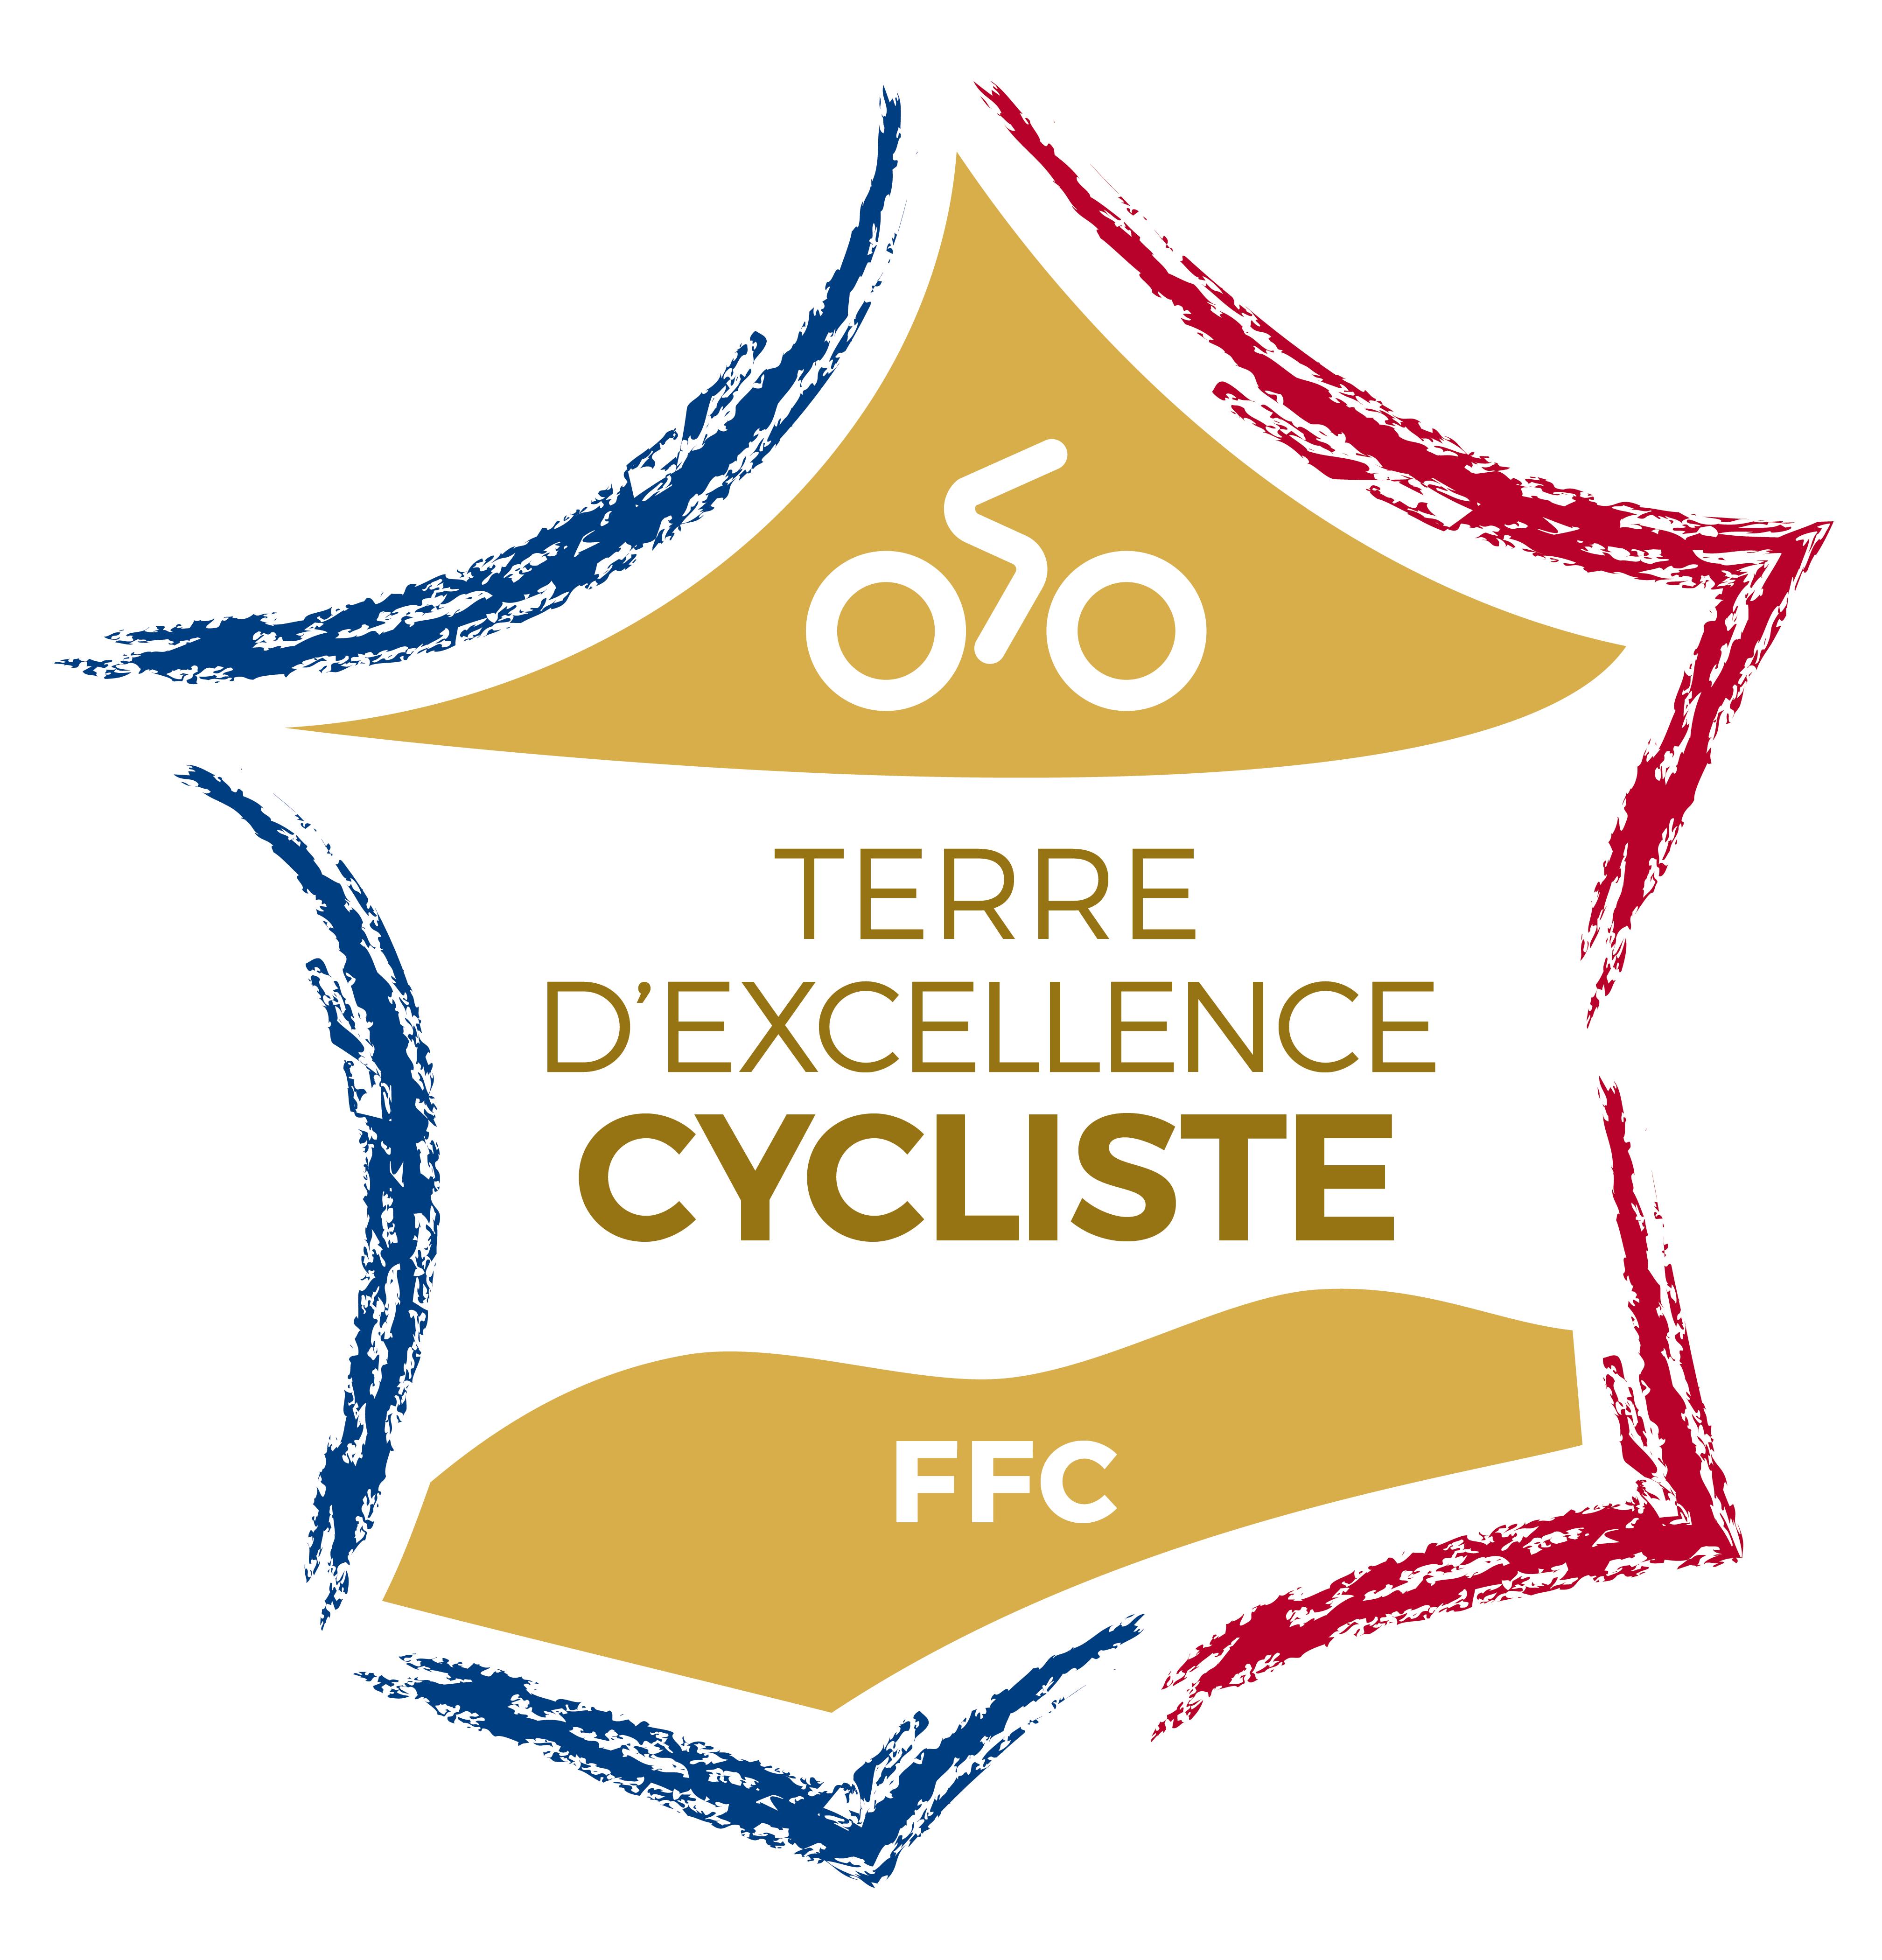 Terre d'excellence cycliste